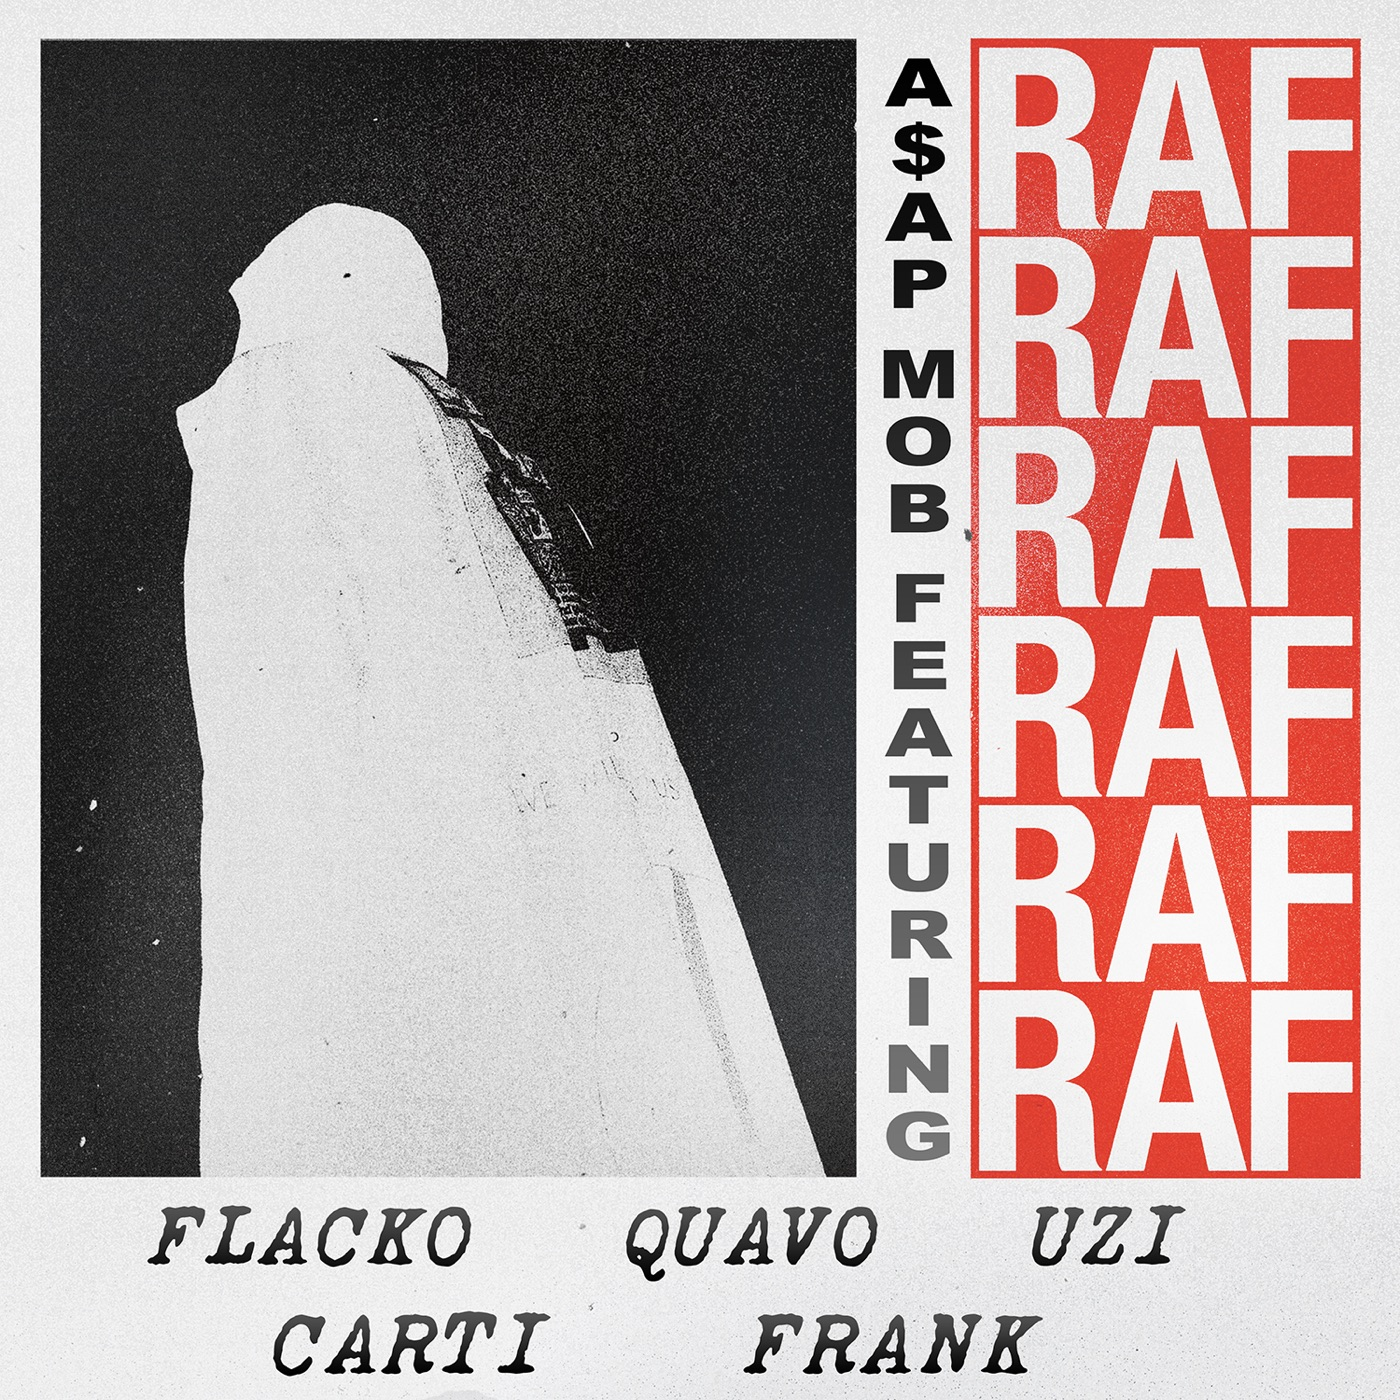 A$AP Mob - Raf (feat. A$AP Rocky, Playboi Carti, Quavo, Lil Uzi Vert & Frank Ocean) - Single Cover